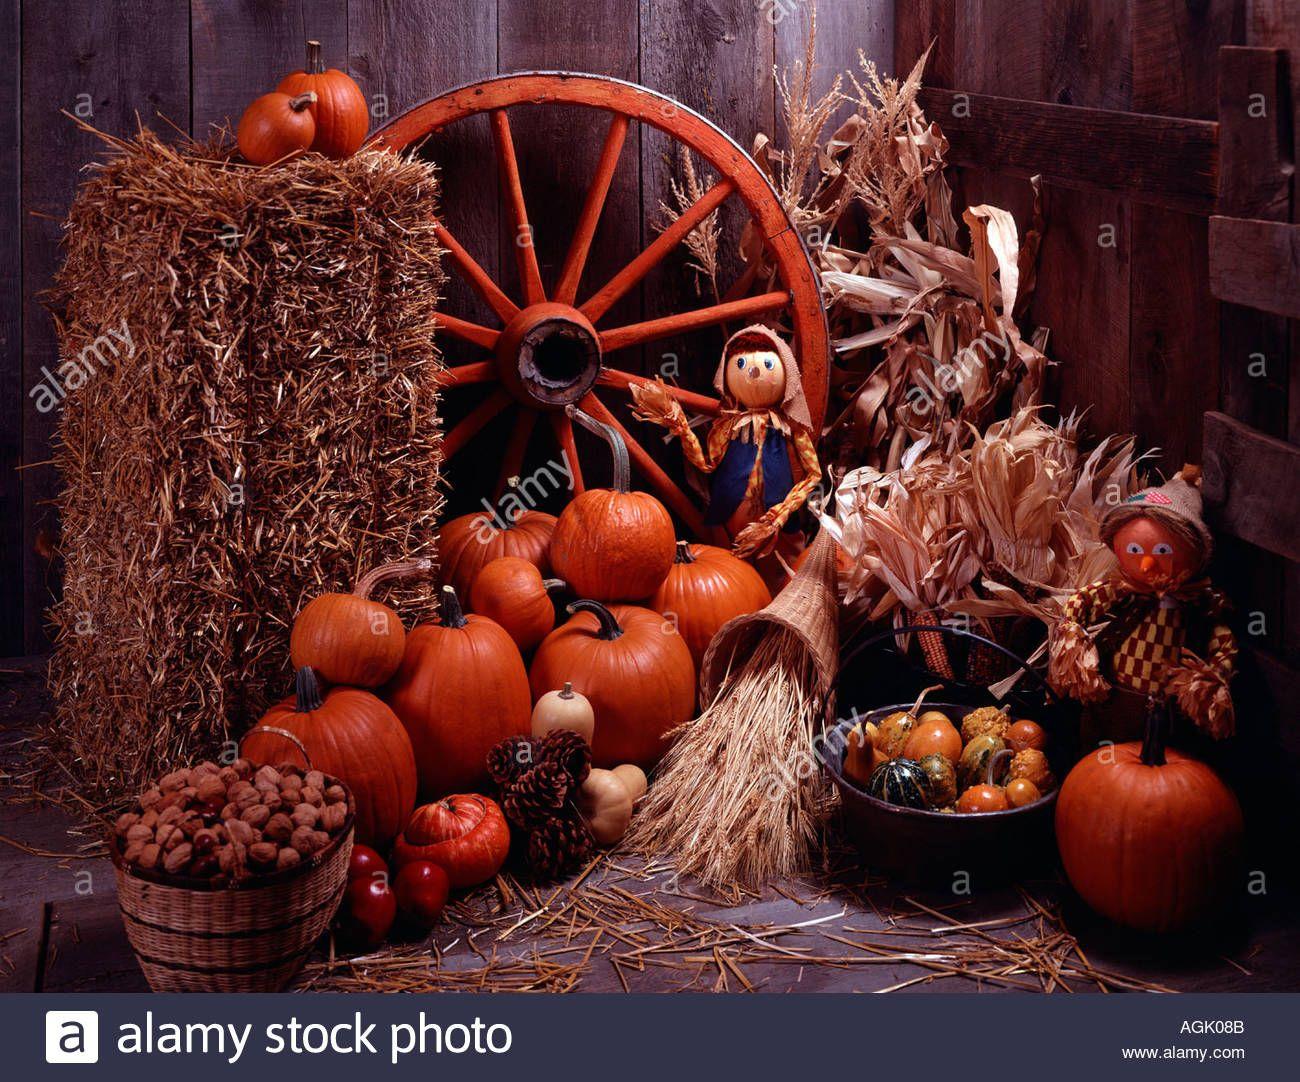 Image result for cornucopia | Thanksgiving decorations ...